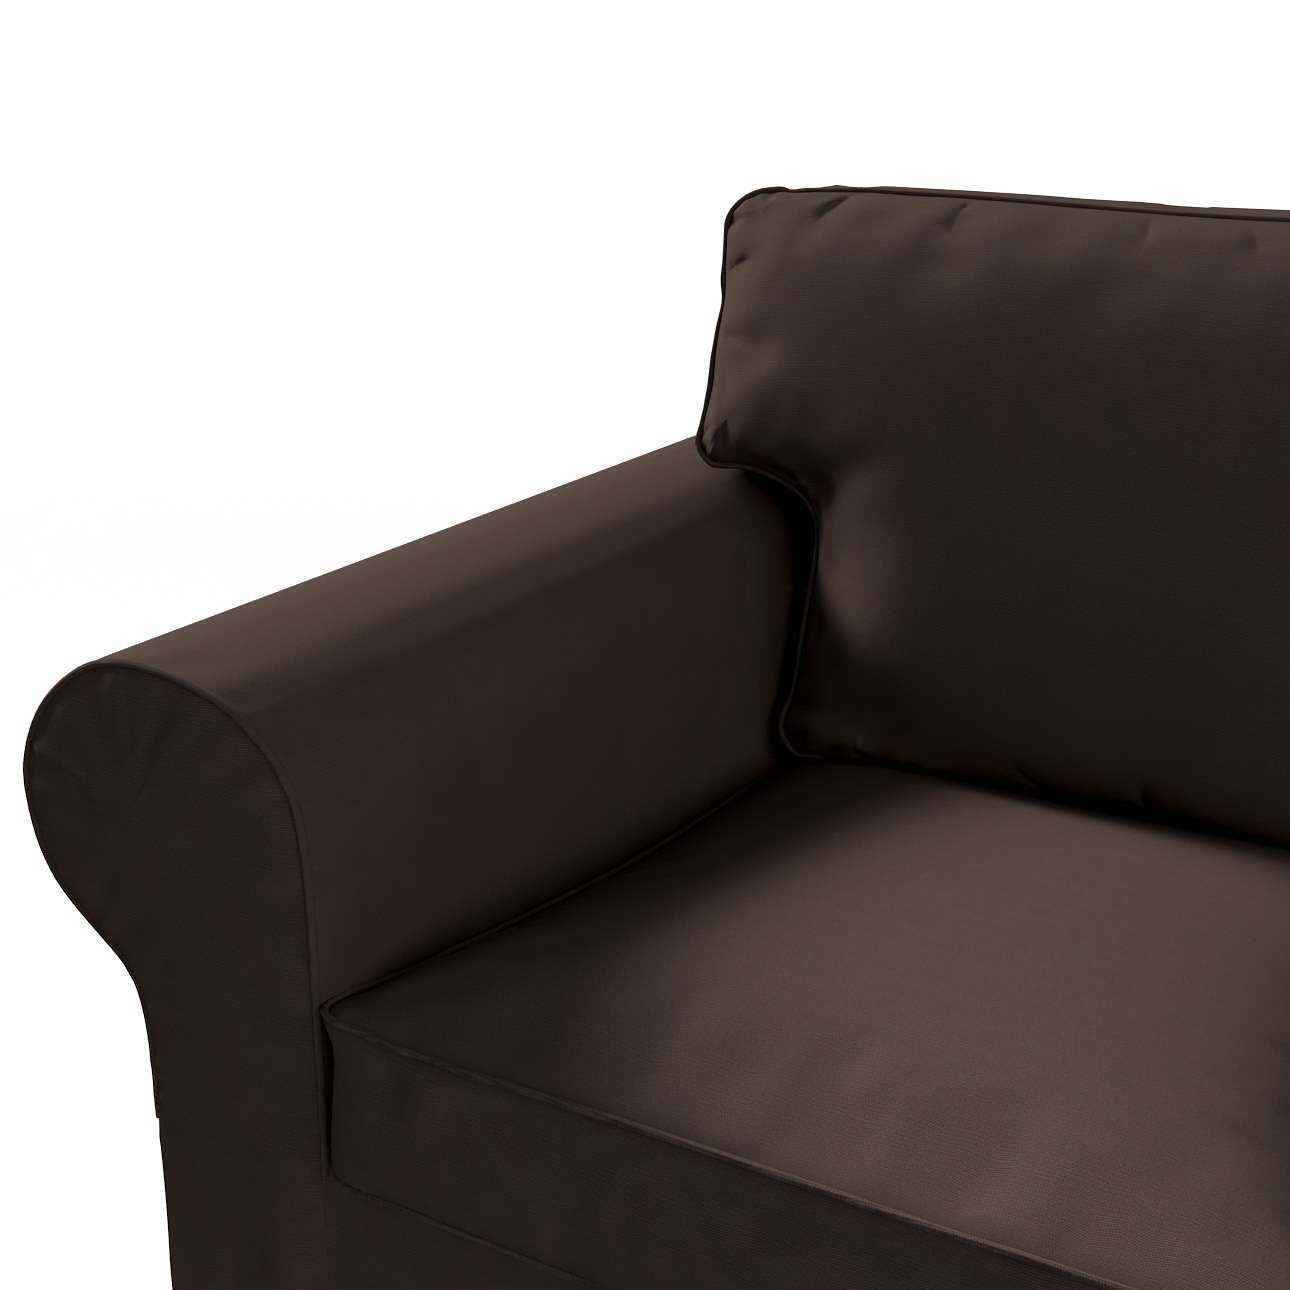 Ektorp 3-Sitzer Sofabezug nicht ausklappbar Sofabezug für  Ektorp 3-Sitzer nicht ausklappbar von der Kollektion Cotton Panama, Stoff: 702-03